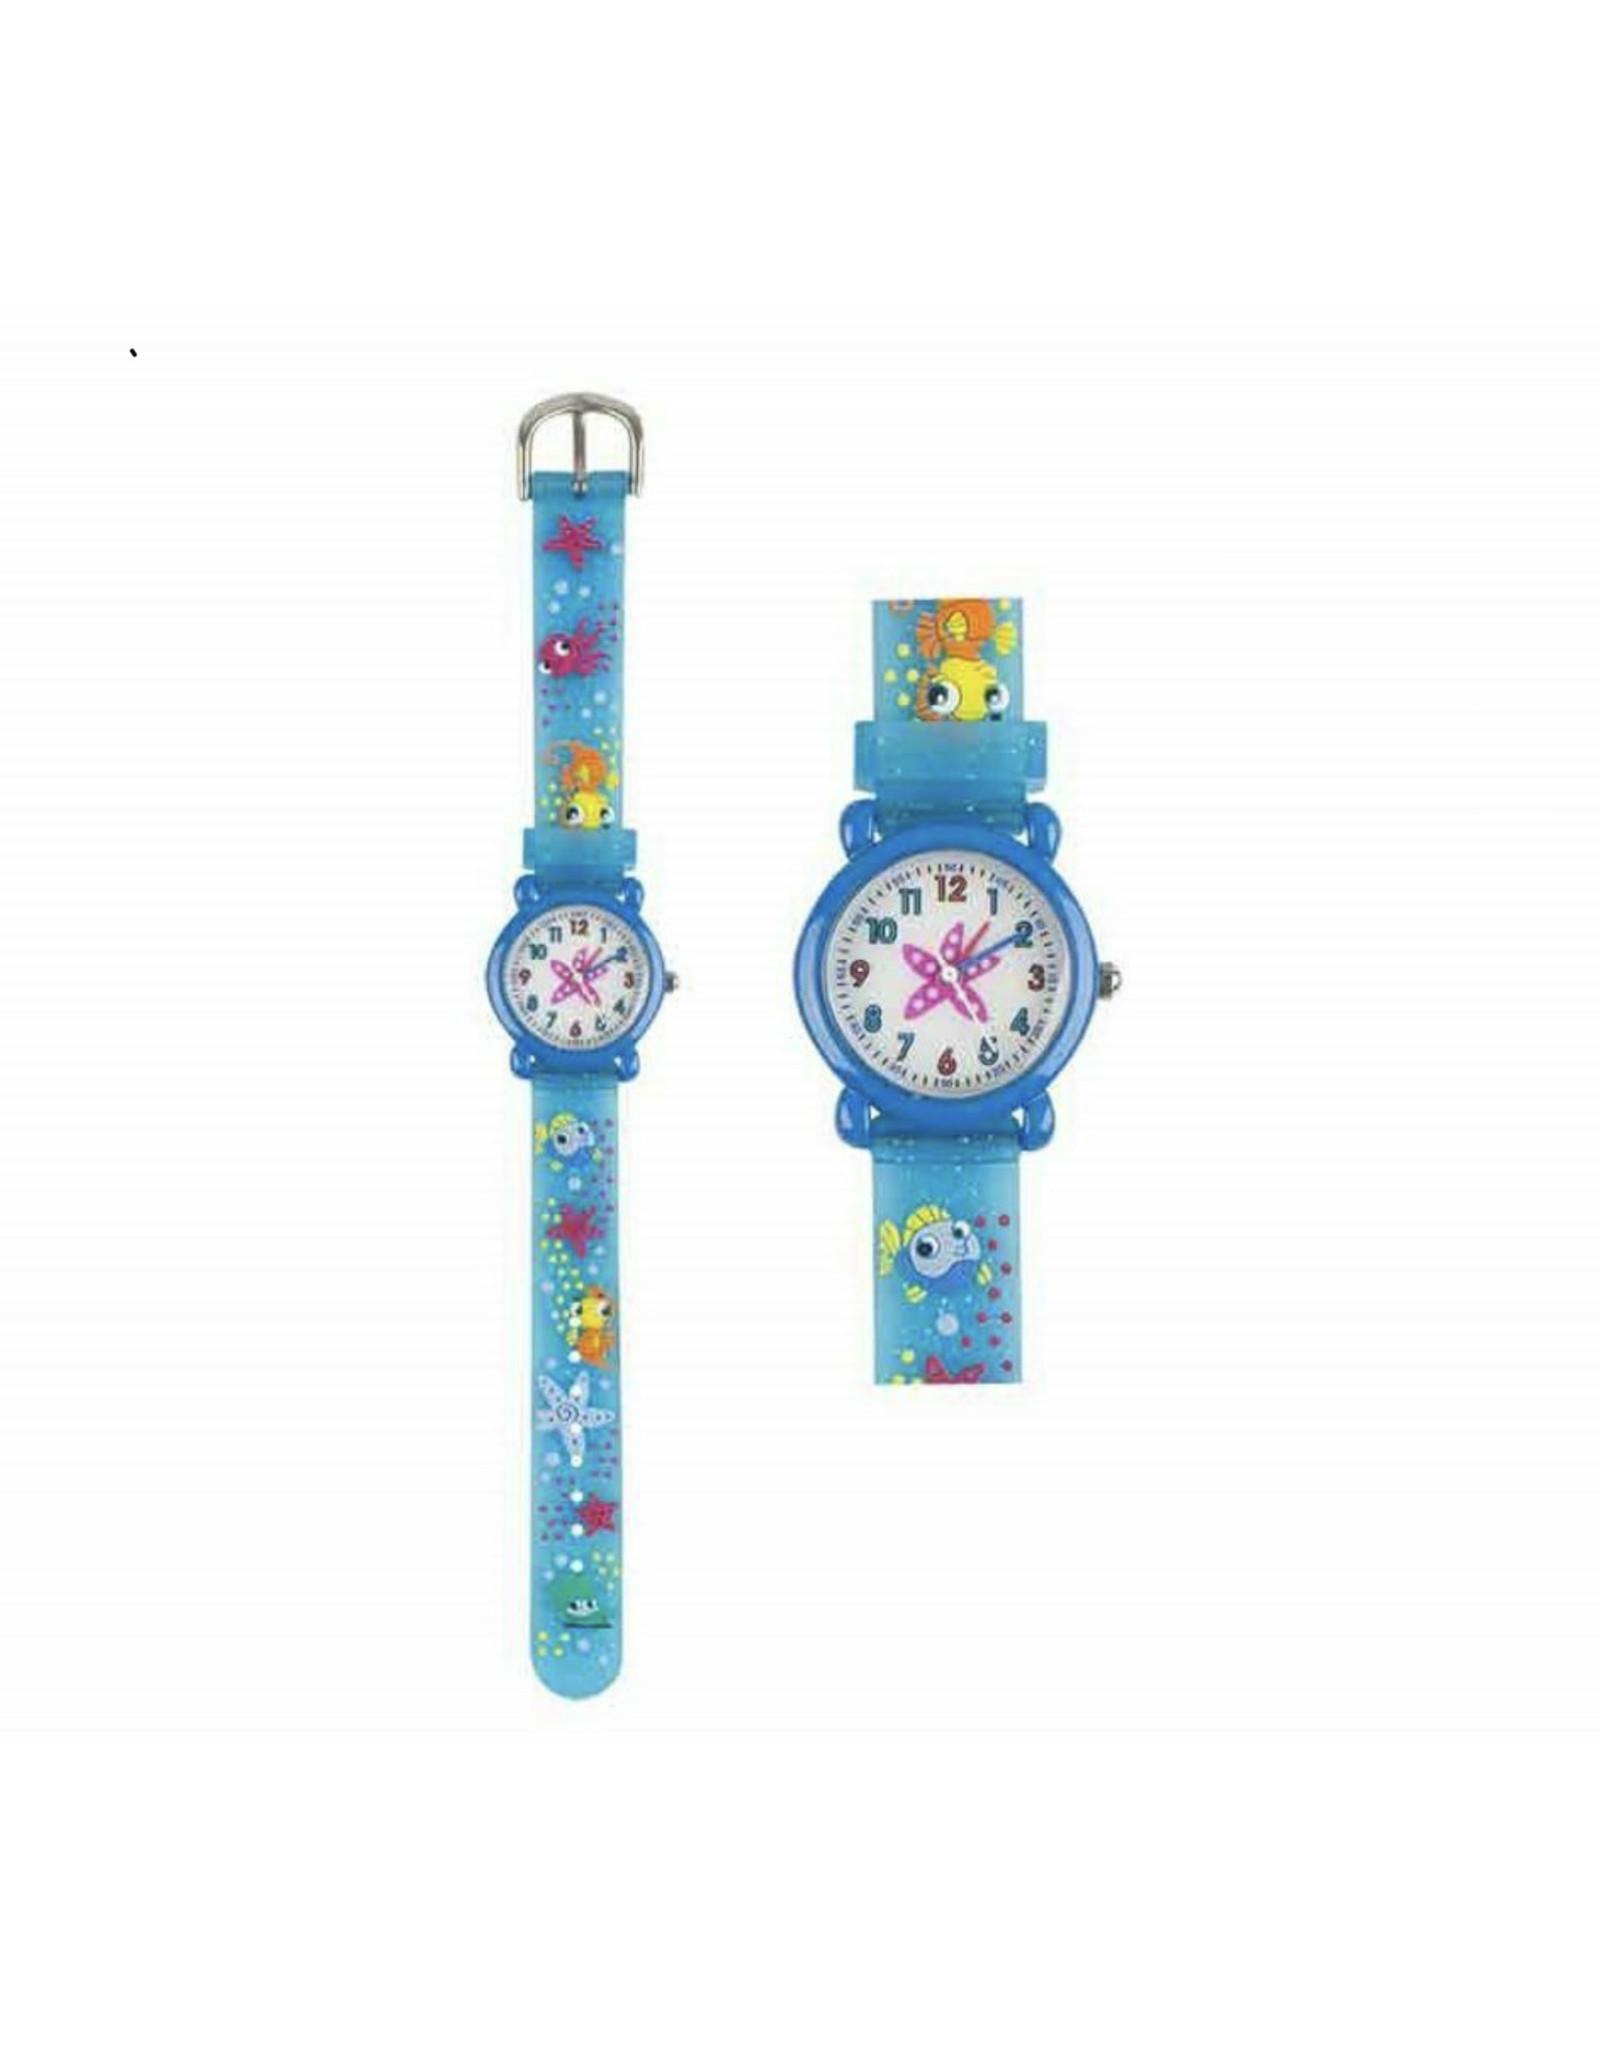 BB Bb kinder horloge diepzee